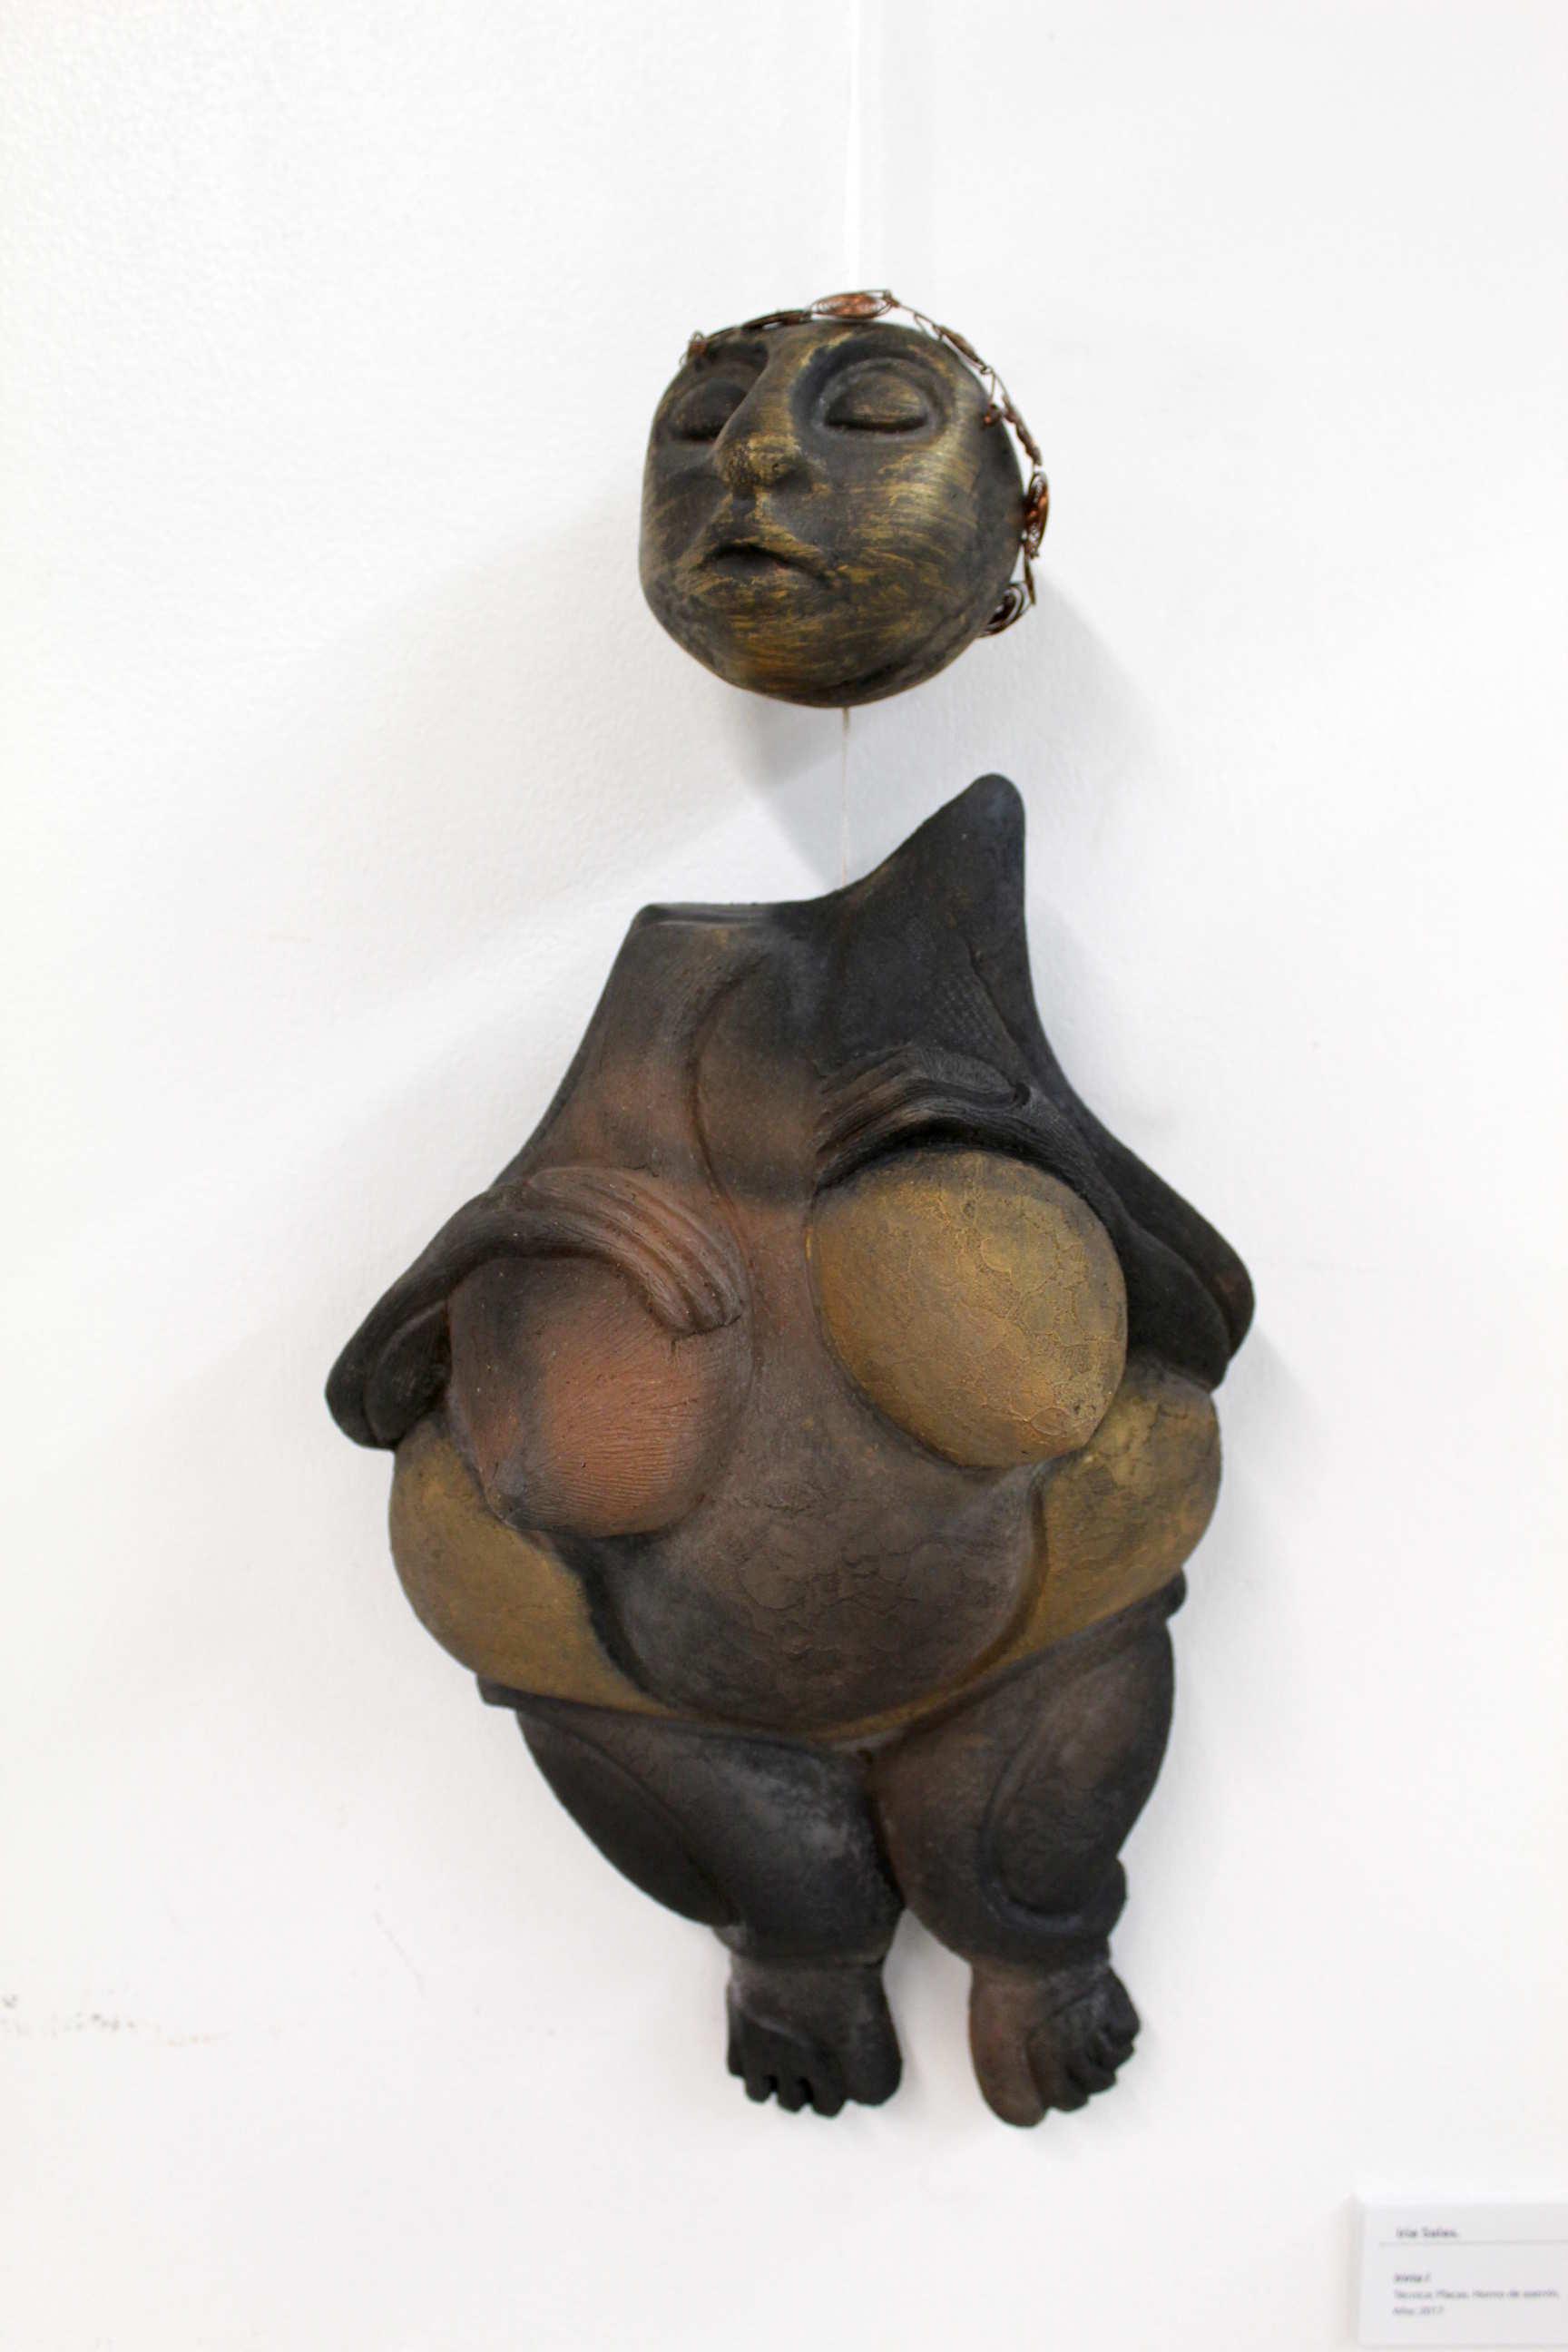 "Obra de Iria Salas, llamada ""Iriria I"", Técnica: Placas. Hornos de aserrín, año 2017. Fotografía: Adriana Araya."